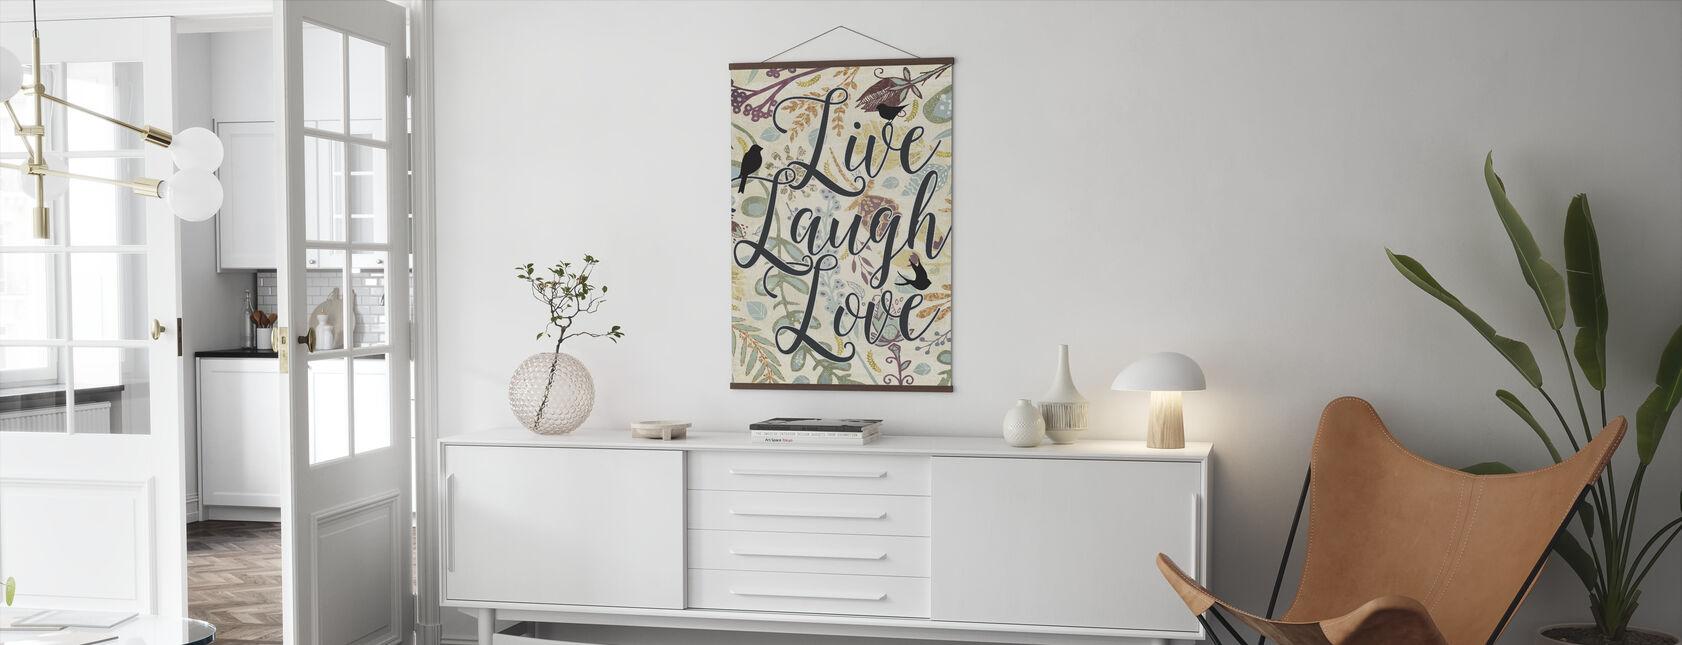 Floral Inspirational - Poster - Living Room